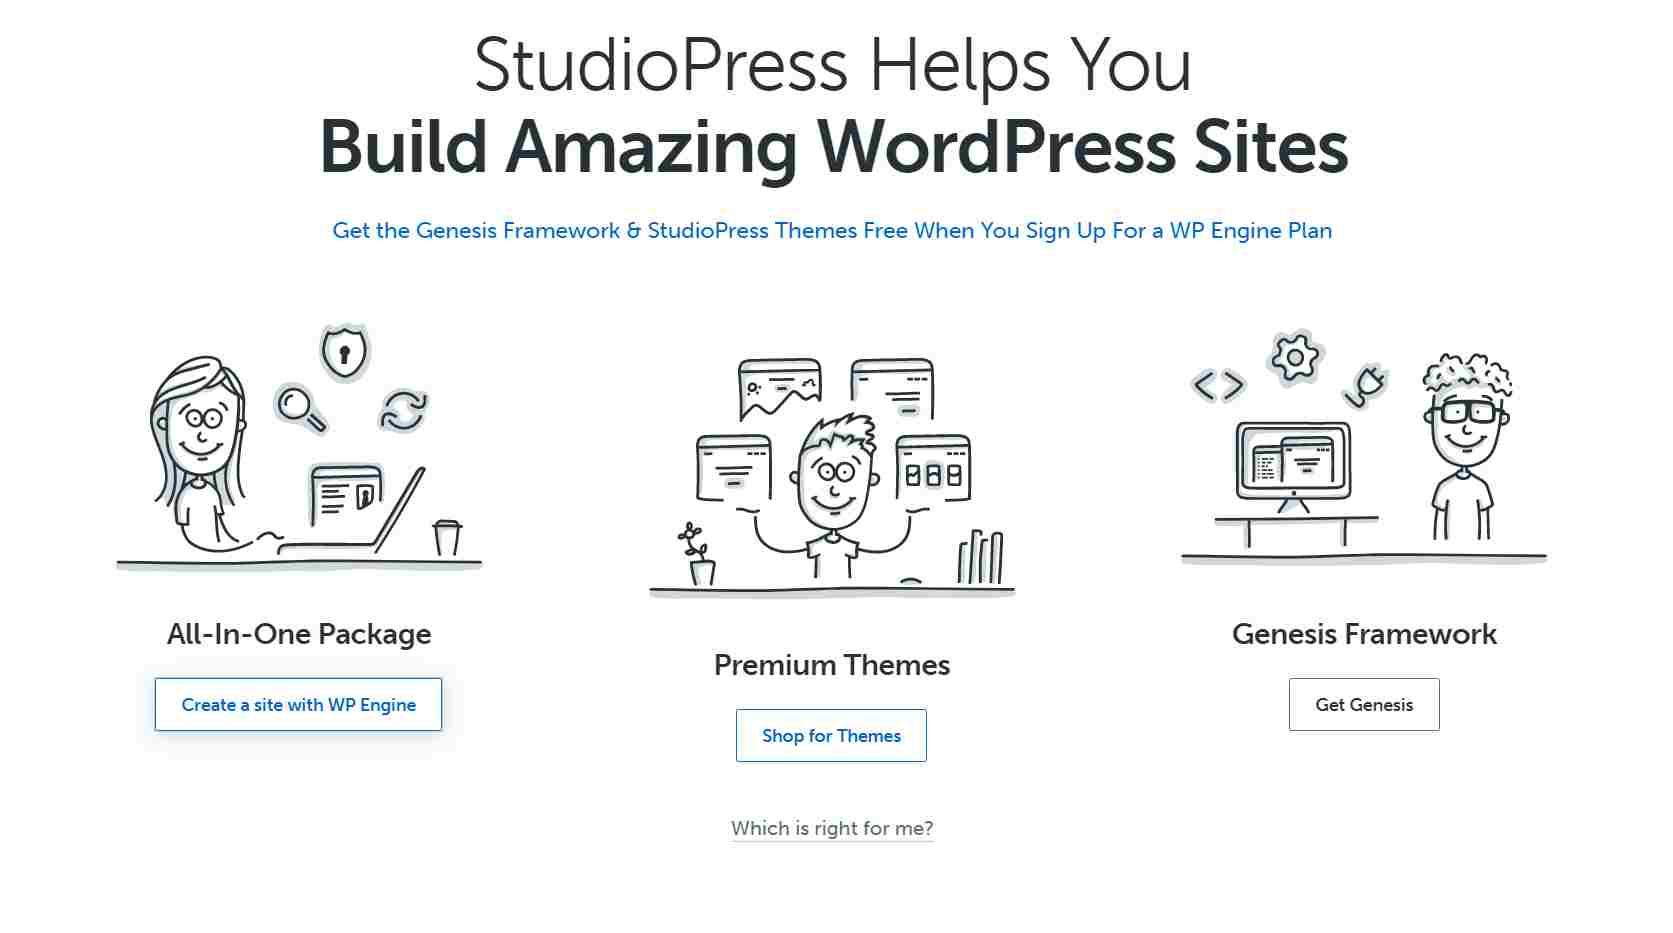 Genesis-Framework-la-gi-StudioPress-la-gi-compressed.jpg